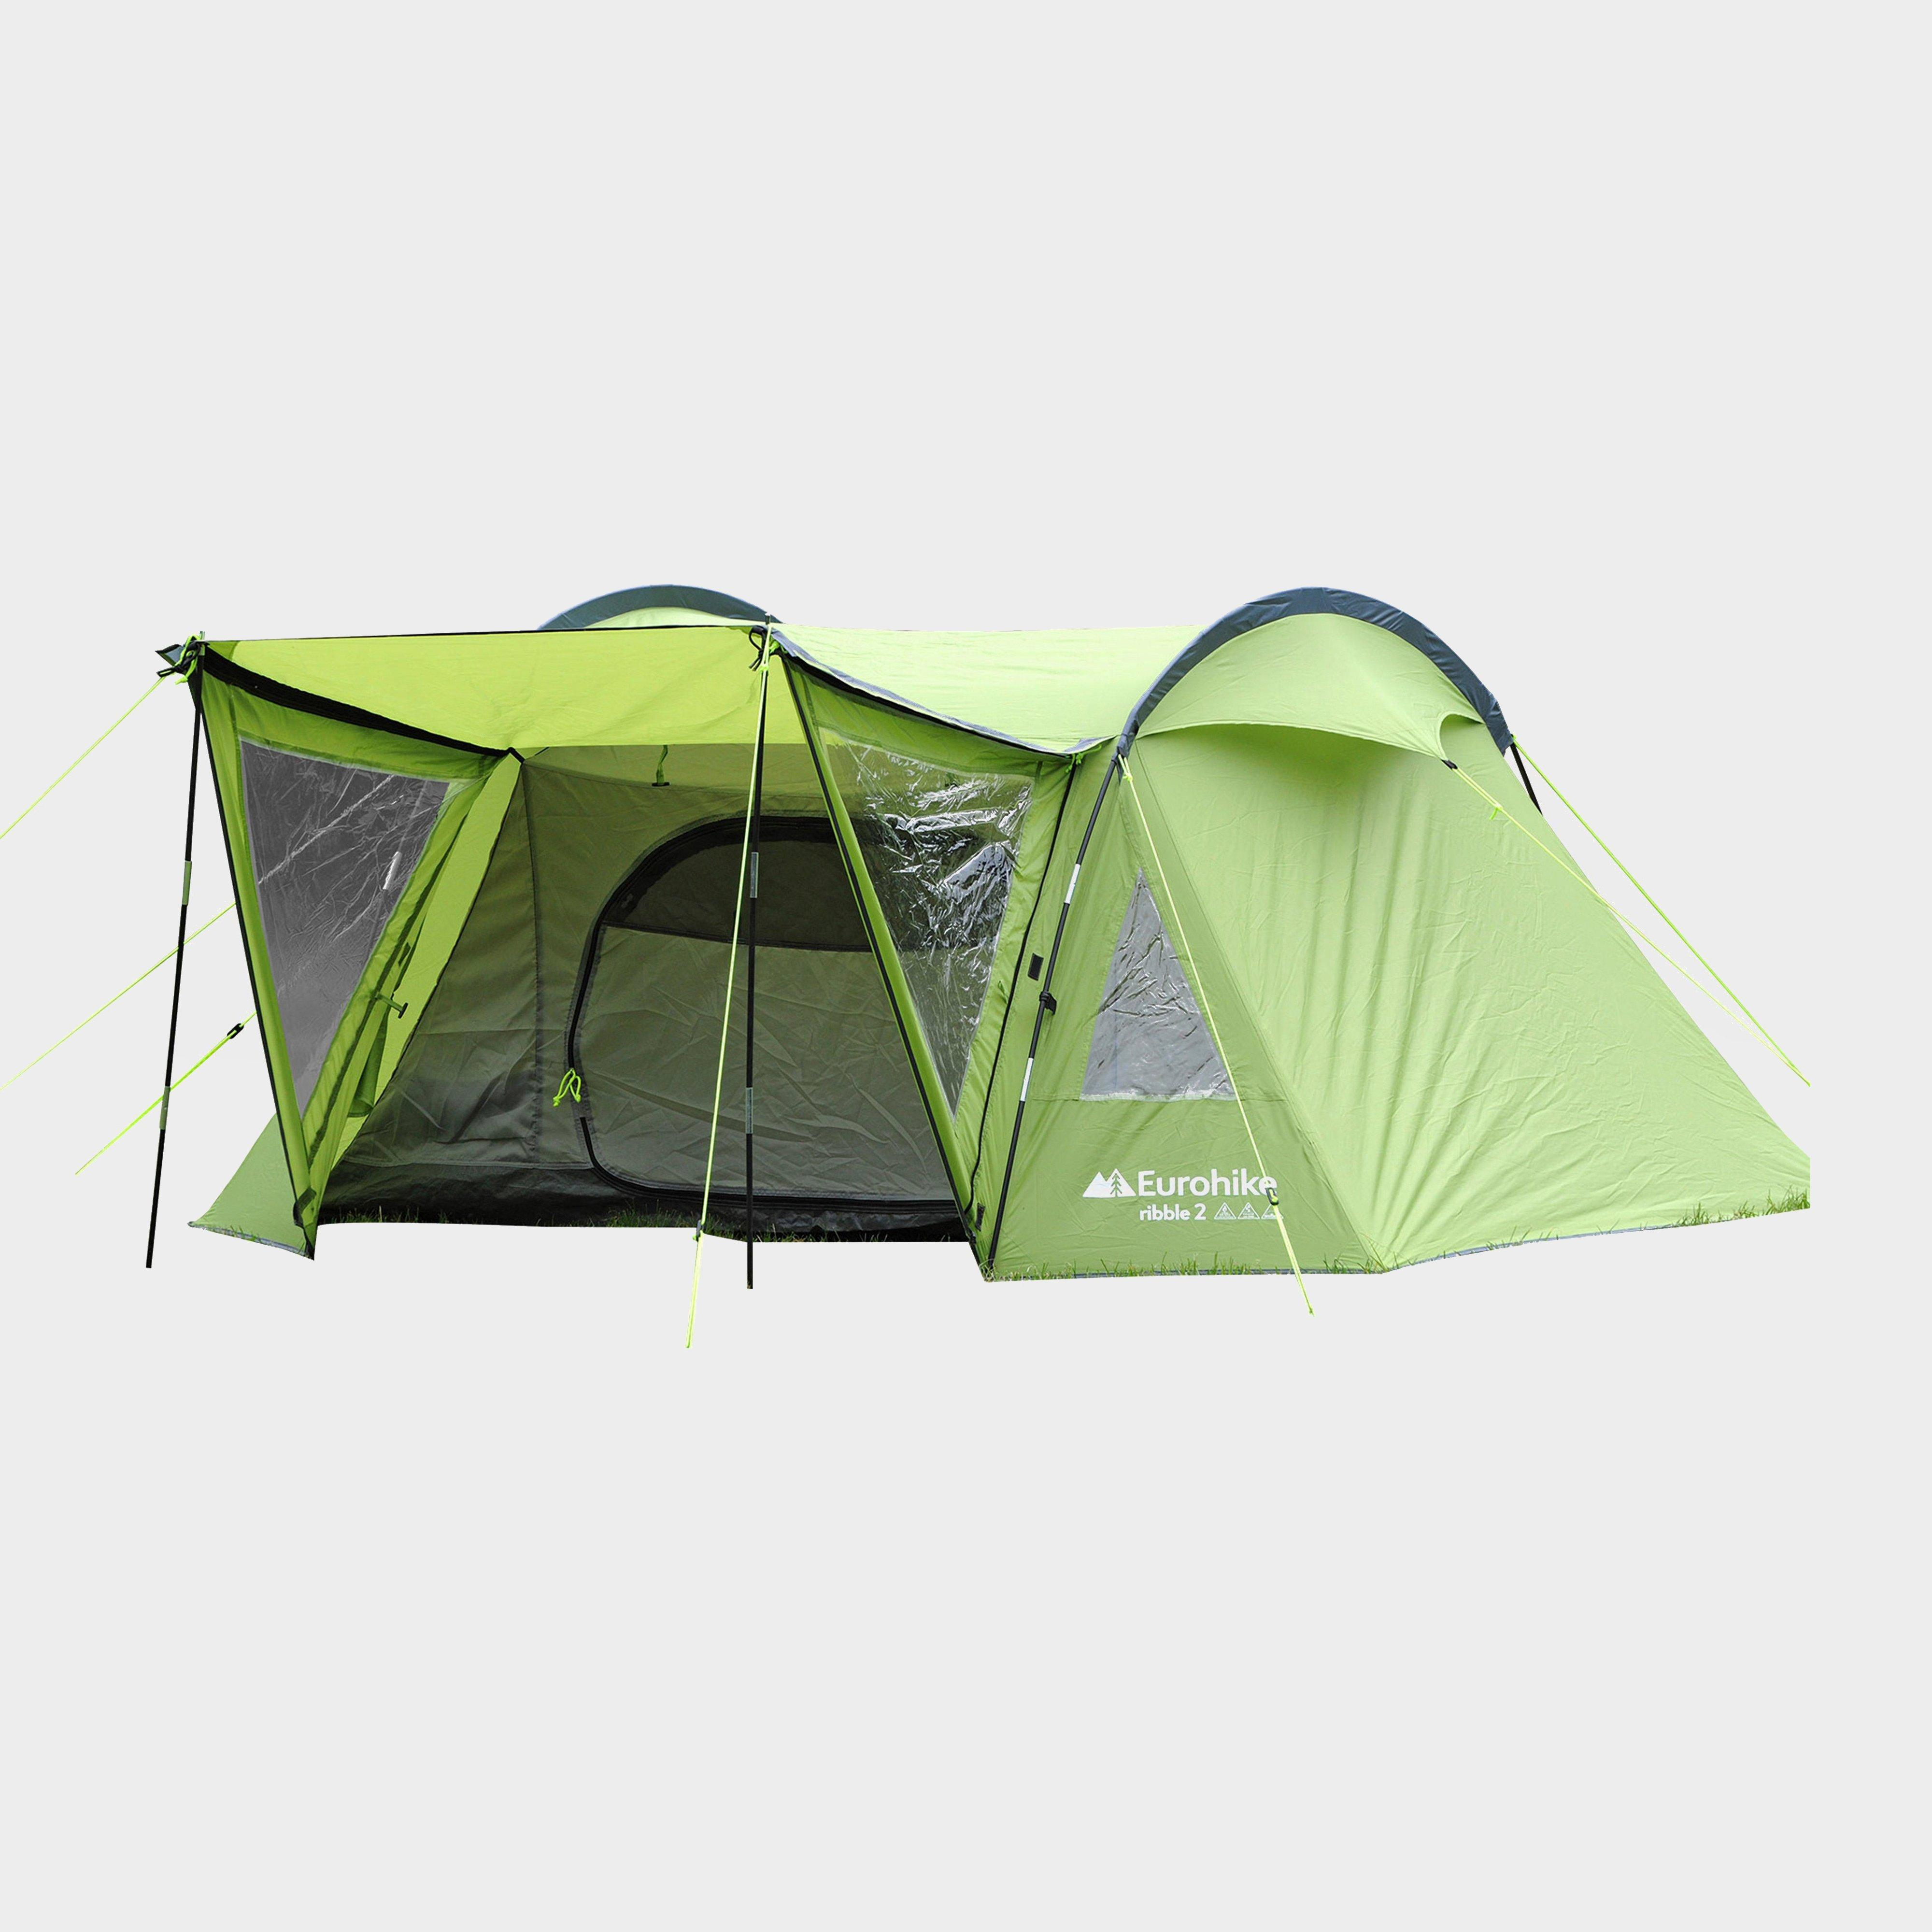 EUROHIKE Ribble 200 2 Person Tent & 2 Man Tents u0026 2 Person Tents | Festival u0026 Pop Up Tents | Millets